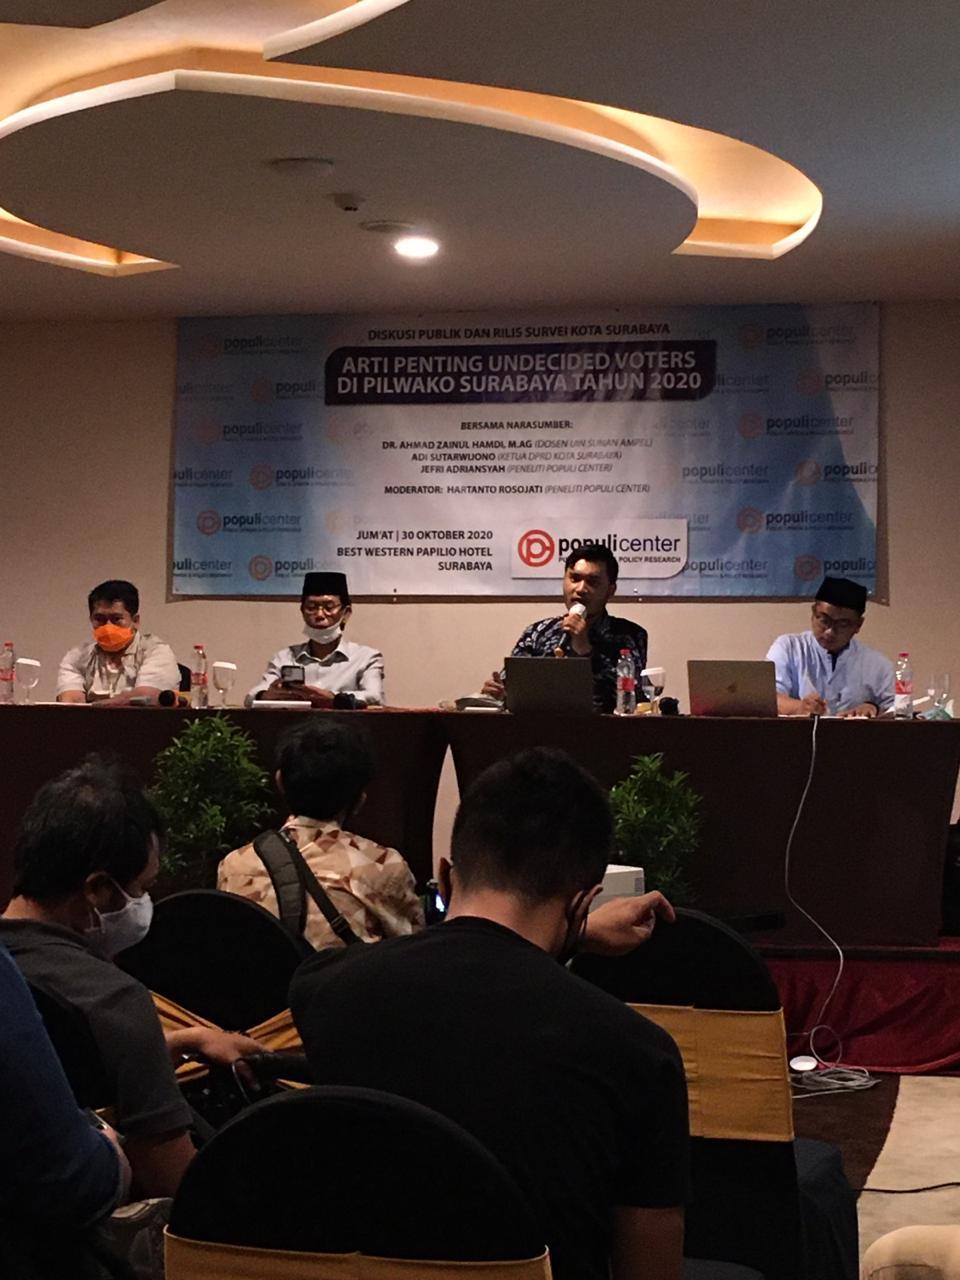 PSI: Baru Sebulan Kampanye, Eri Cahyadi Sudah Ungguli Machfud Arifin